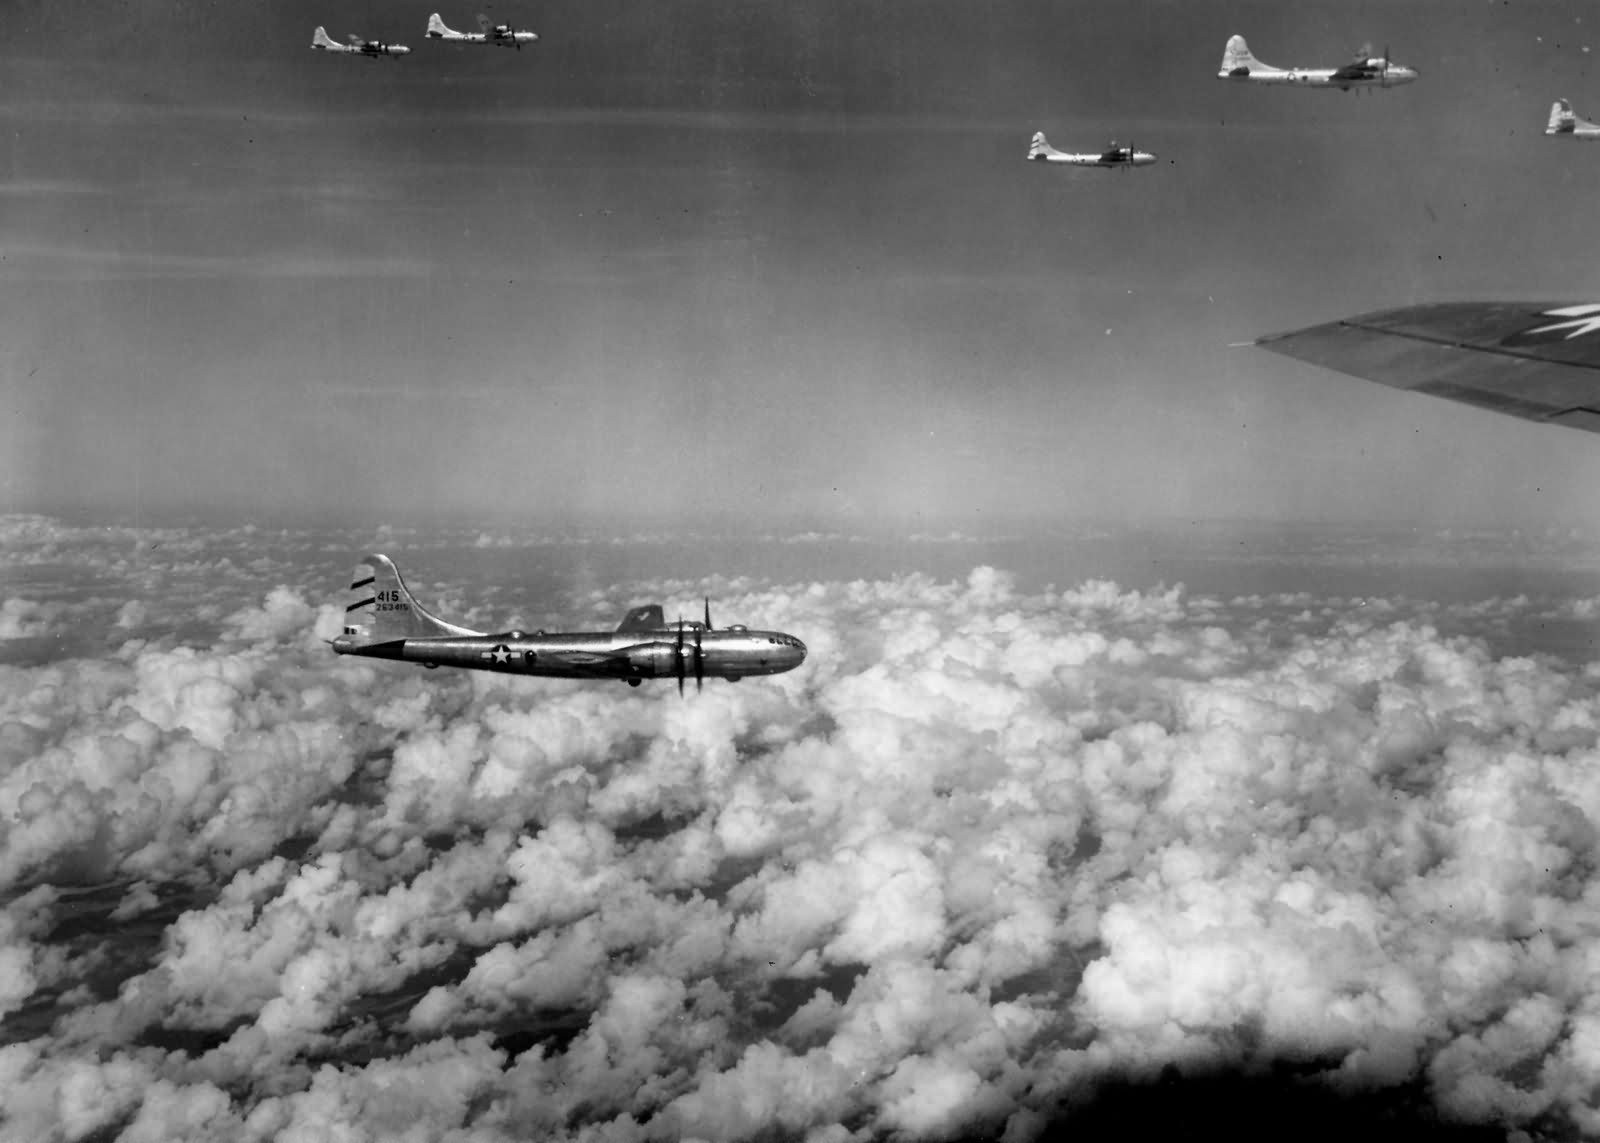 468th bomb group B-29 Superfortress Formation over Rangoon Burma November 1944